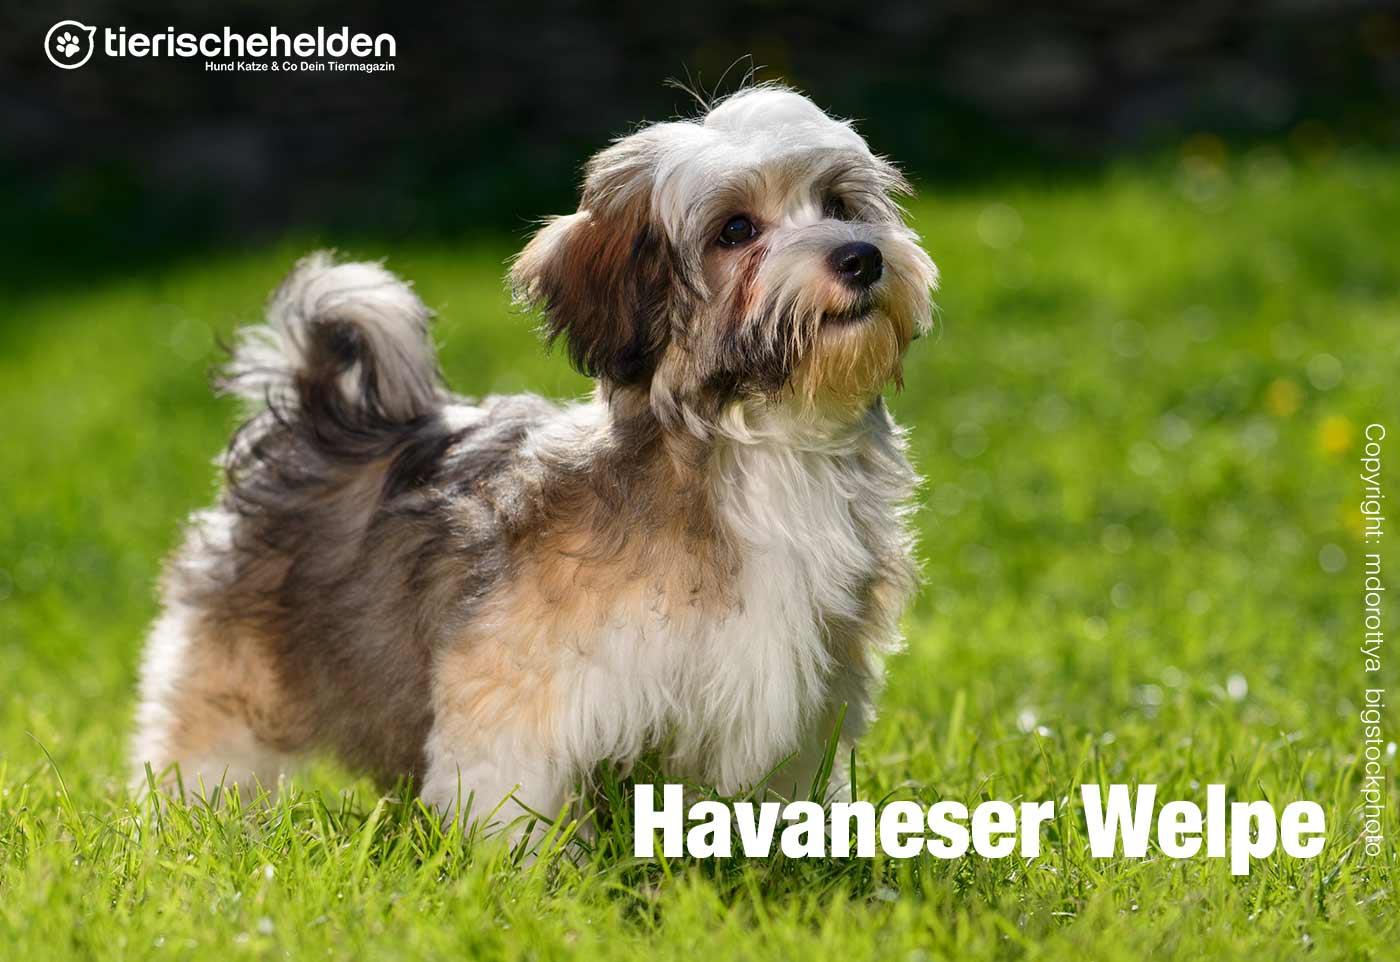 Havaneser Welpe